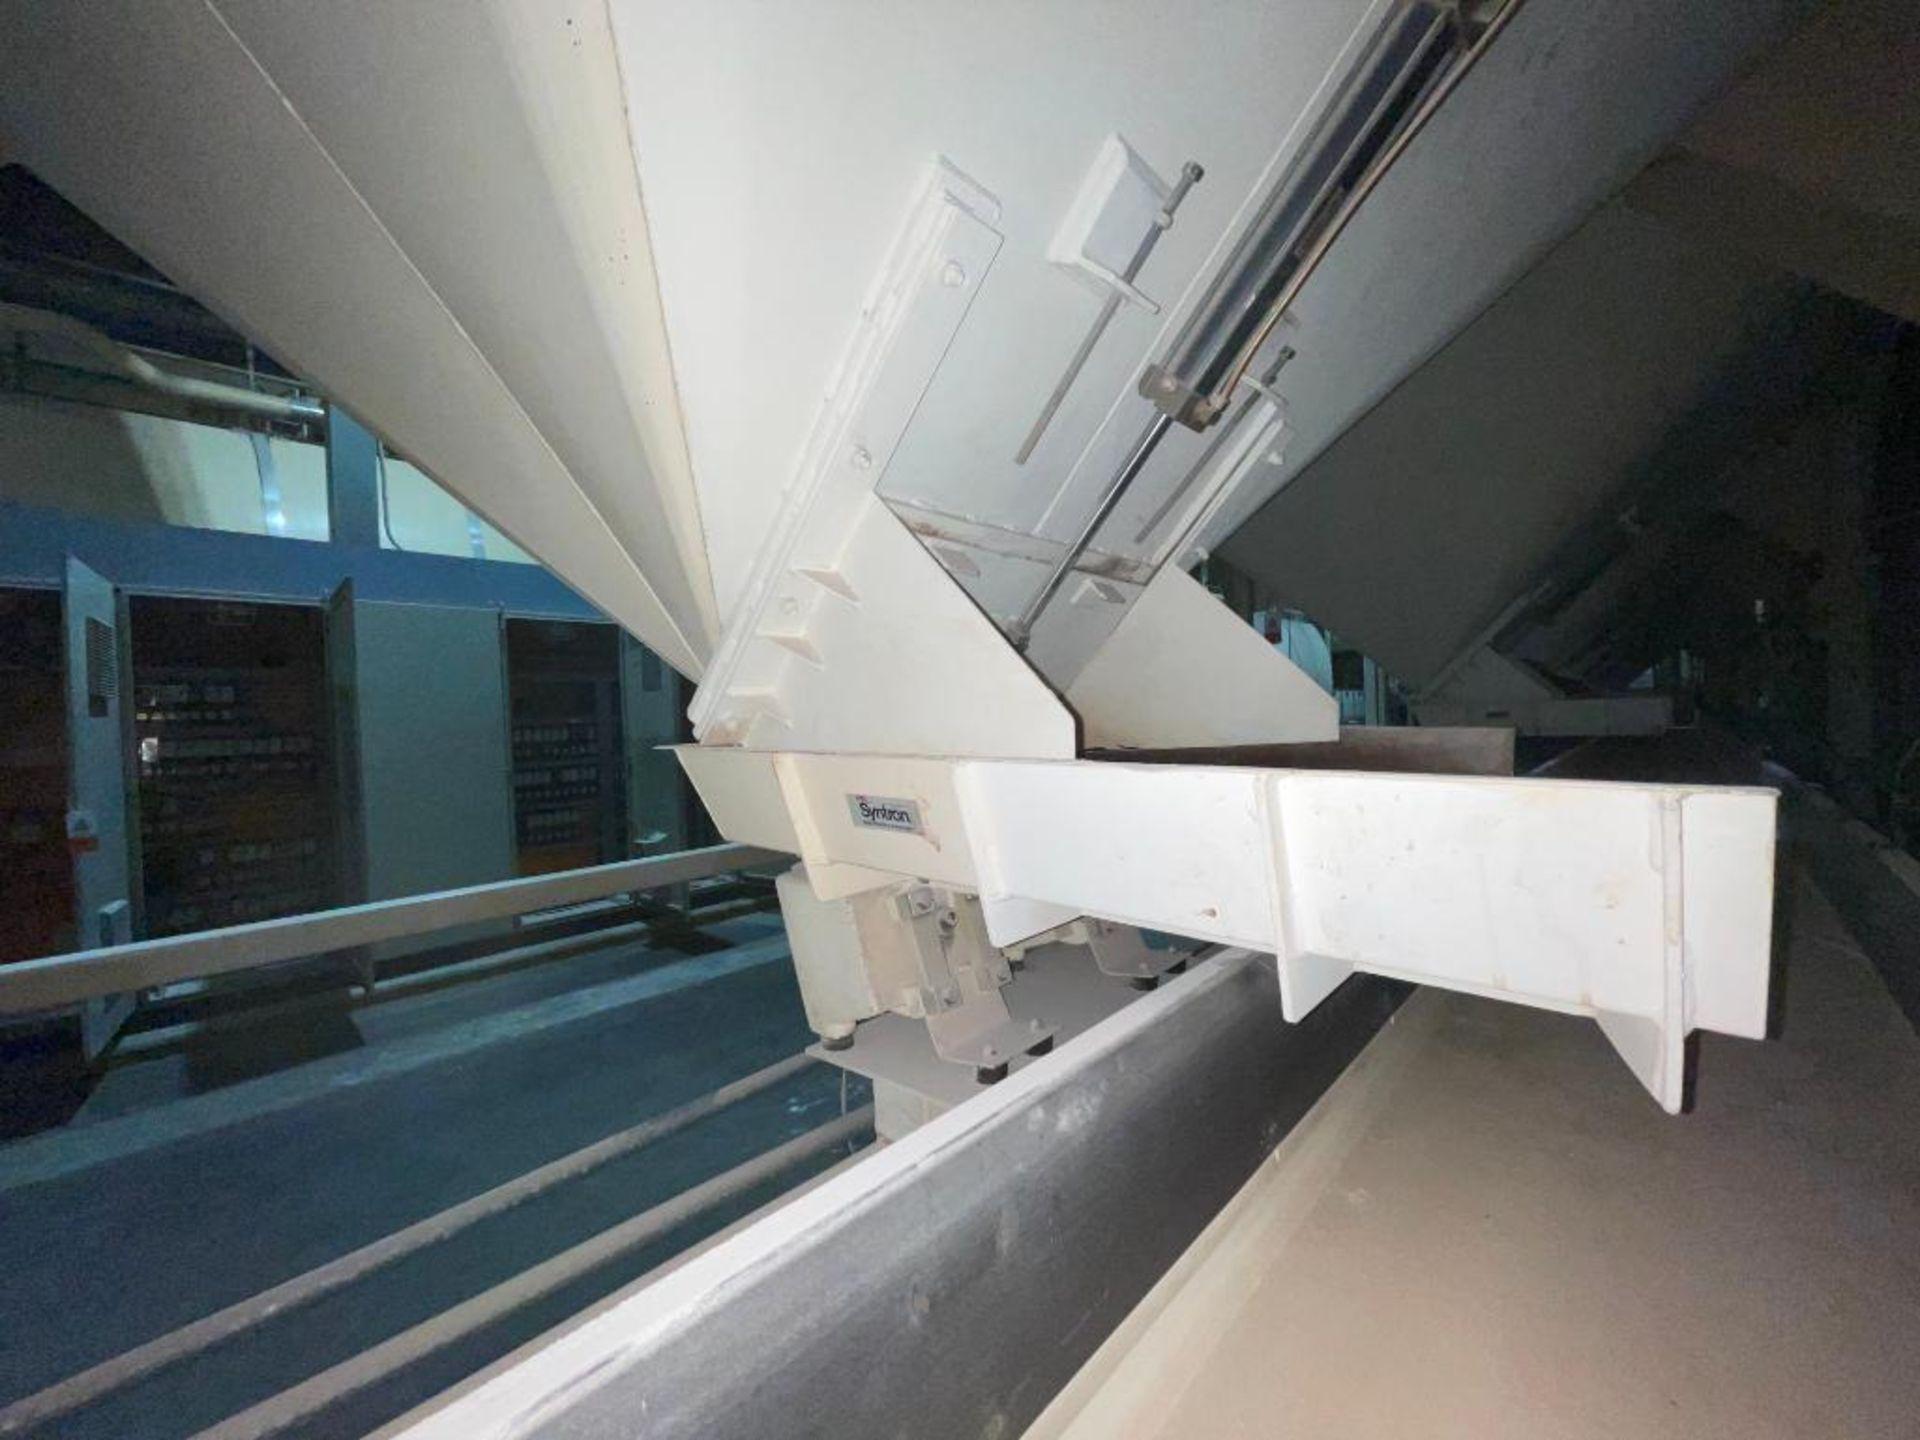 Aseeco mild steel cone bottom bulk storage bin - Image 28 of 28